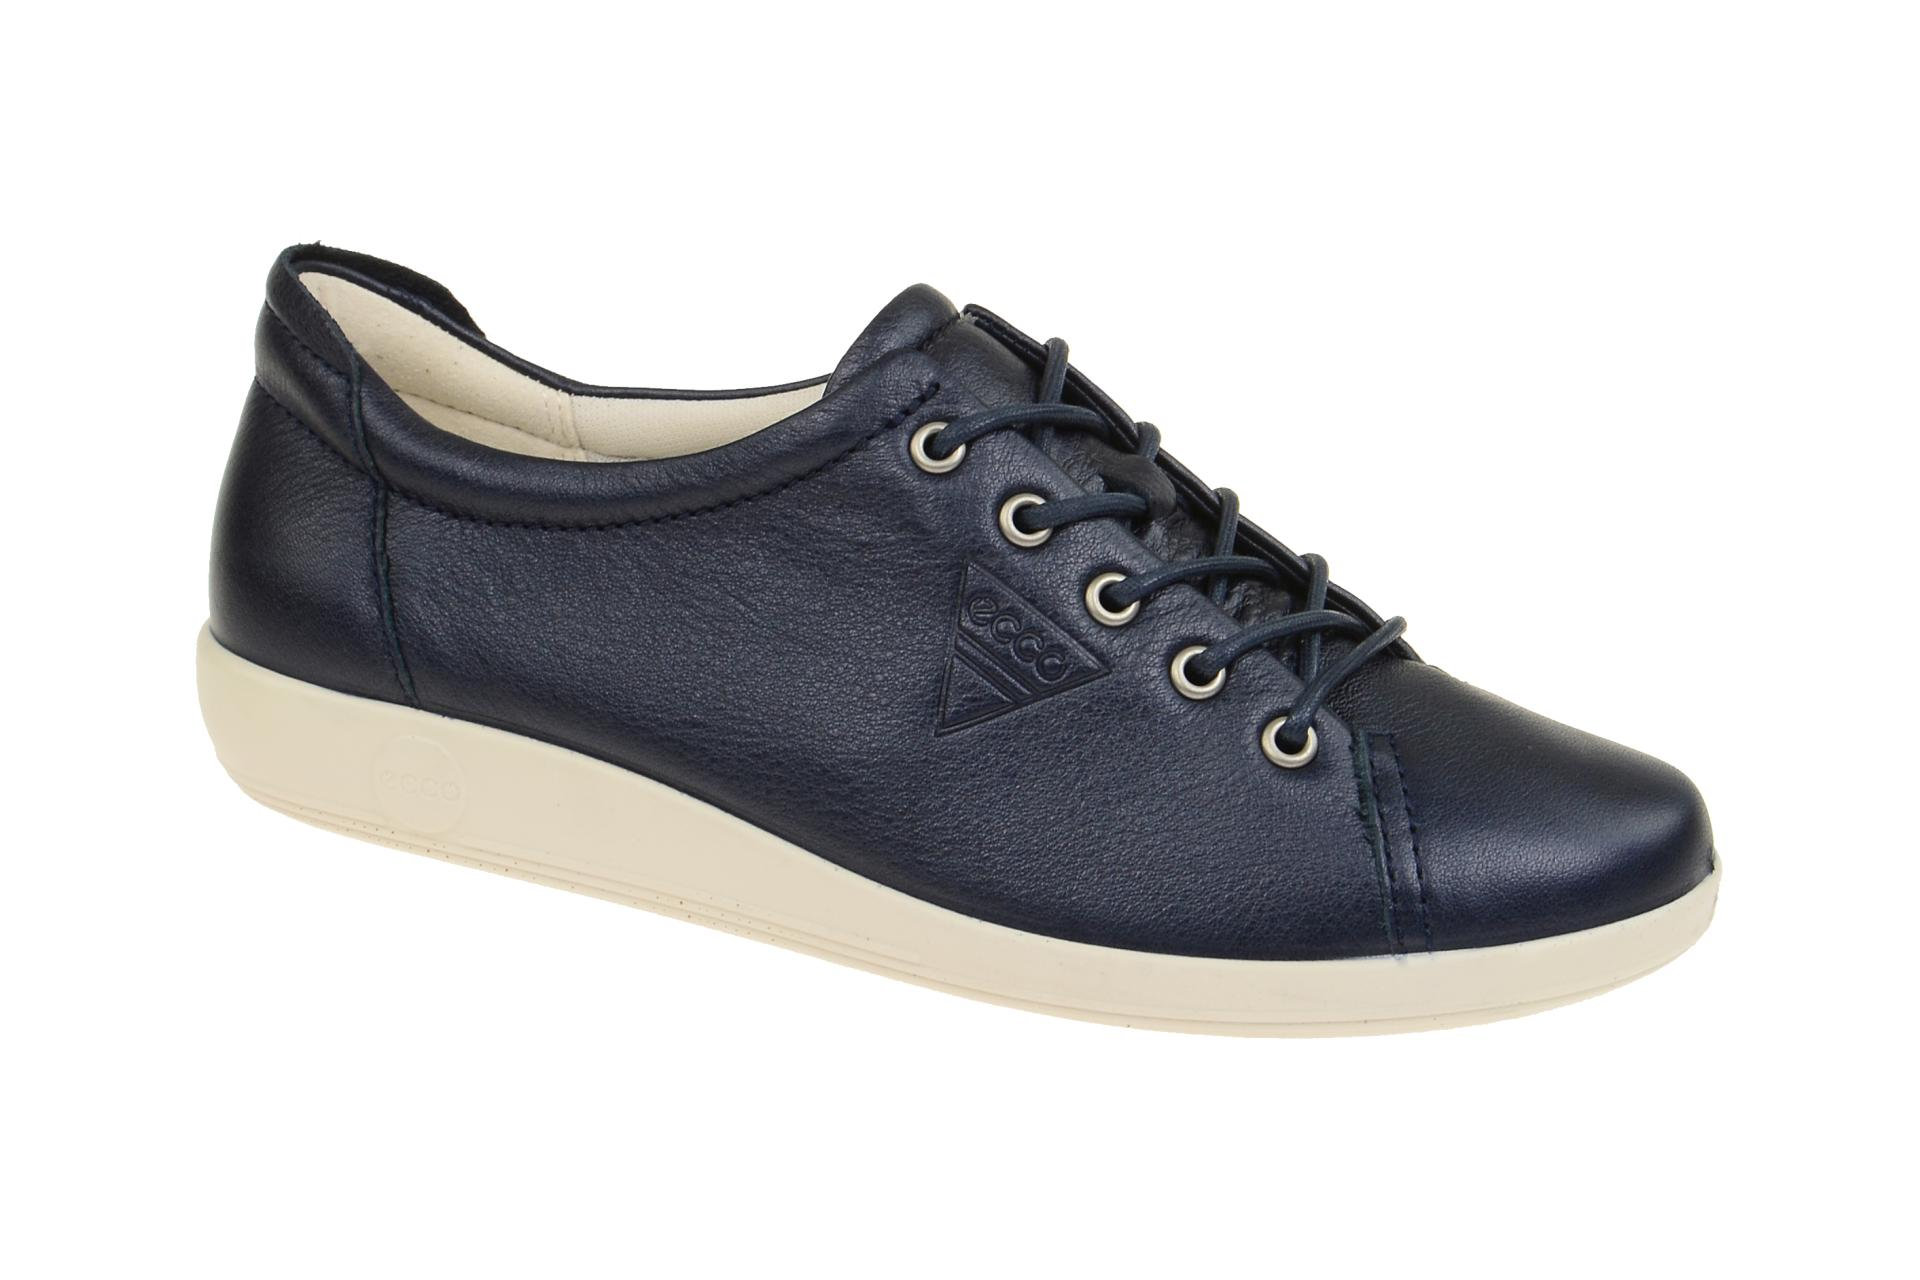 eba125f05ca17a Ecco Soft 2 Damen Schuhe blau metallic - Schuhhaus Strauch Shop